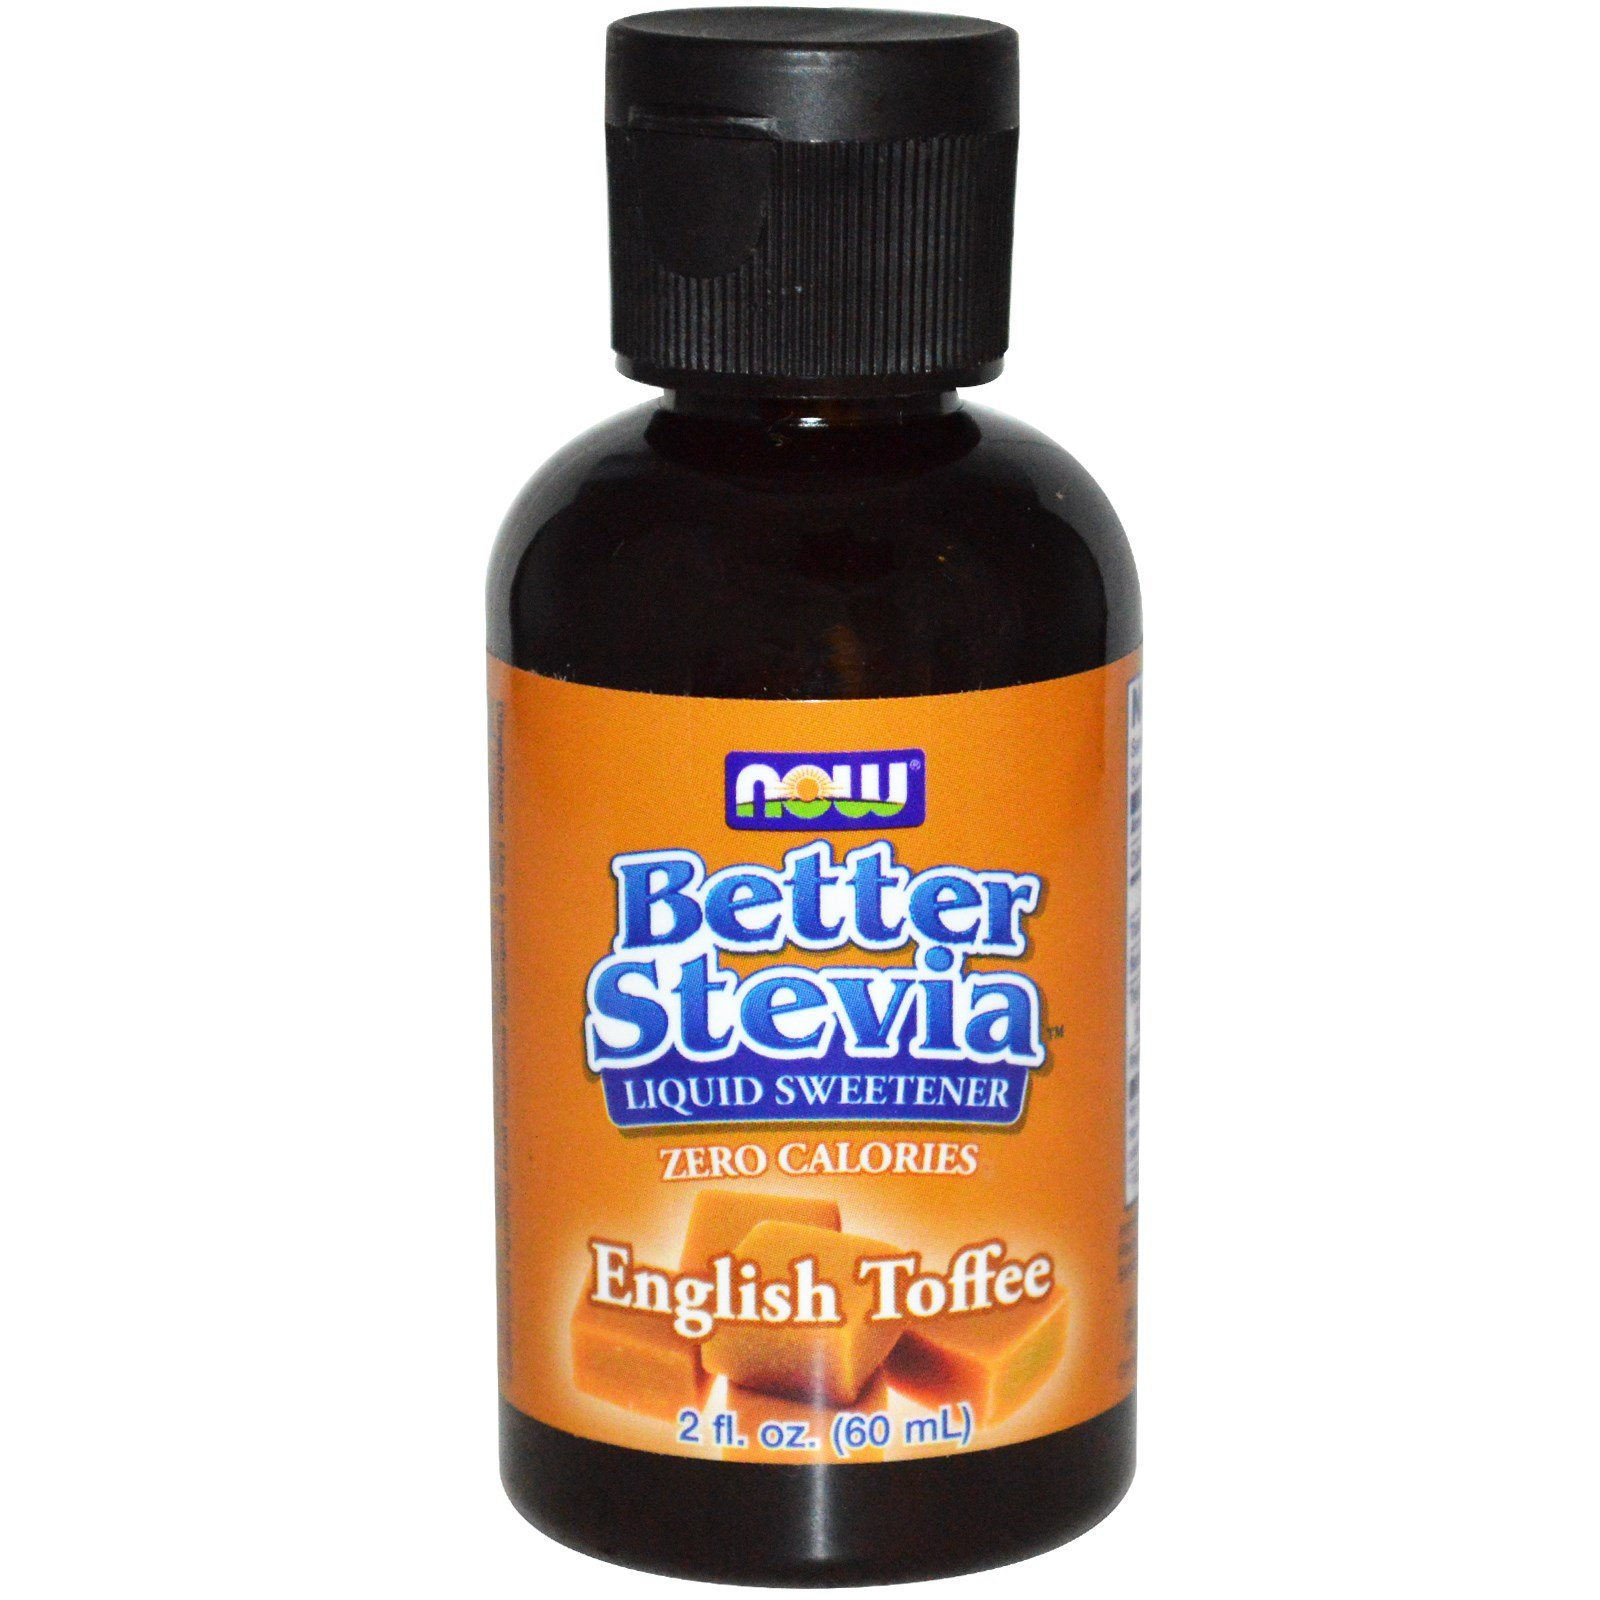 Better Stevia Liquid Sweetener English Toffee, English Toffee 2 fl oz (Pack of 6)